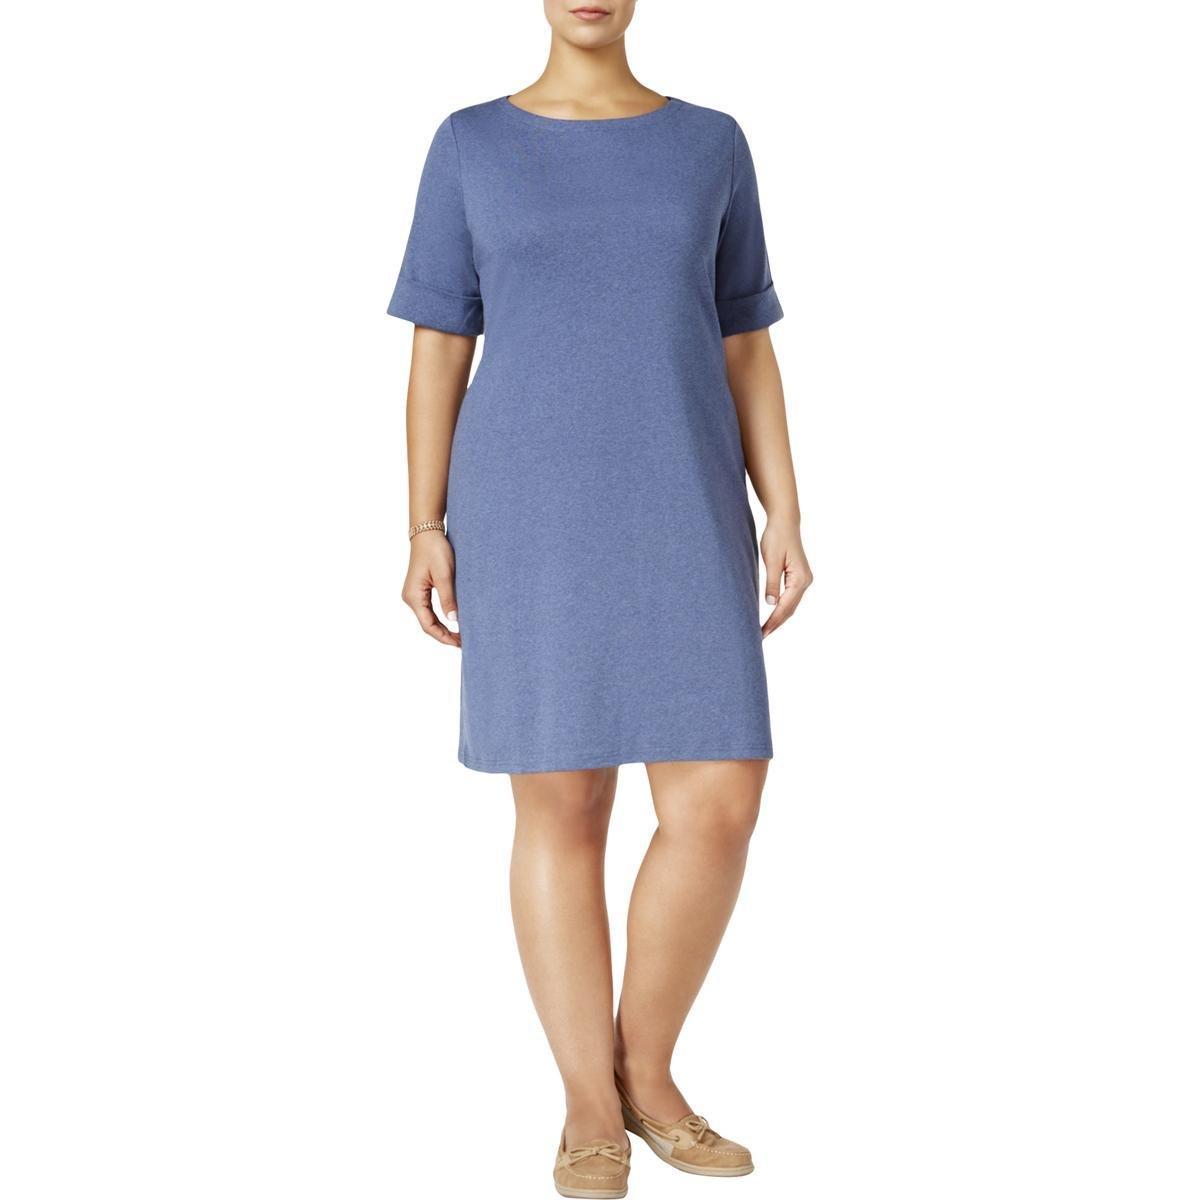 Karen Scott Womens Plus ElbowSleeves Pullover Casual Dress Blue 0X